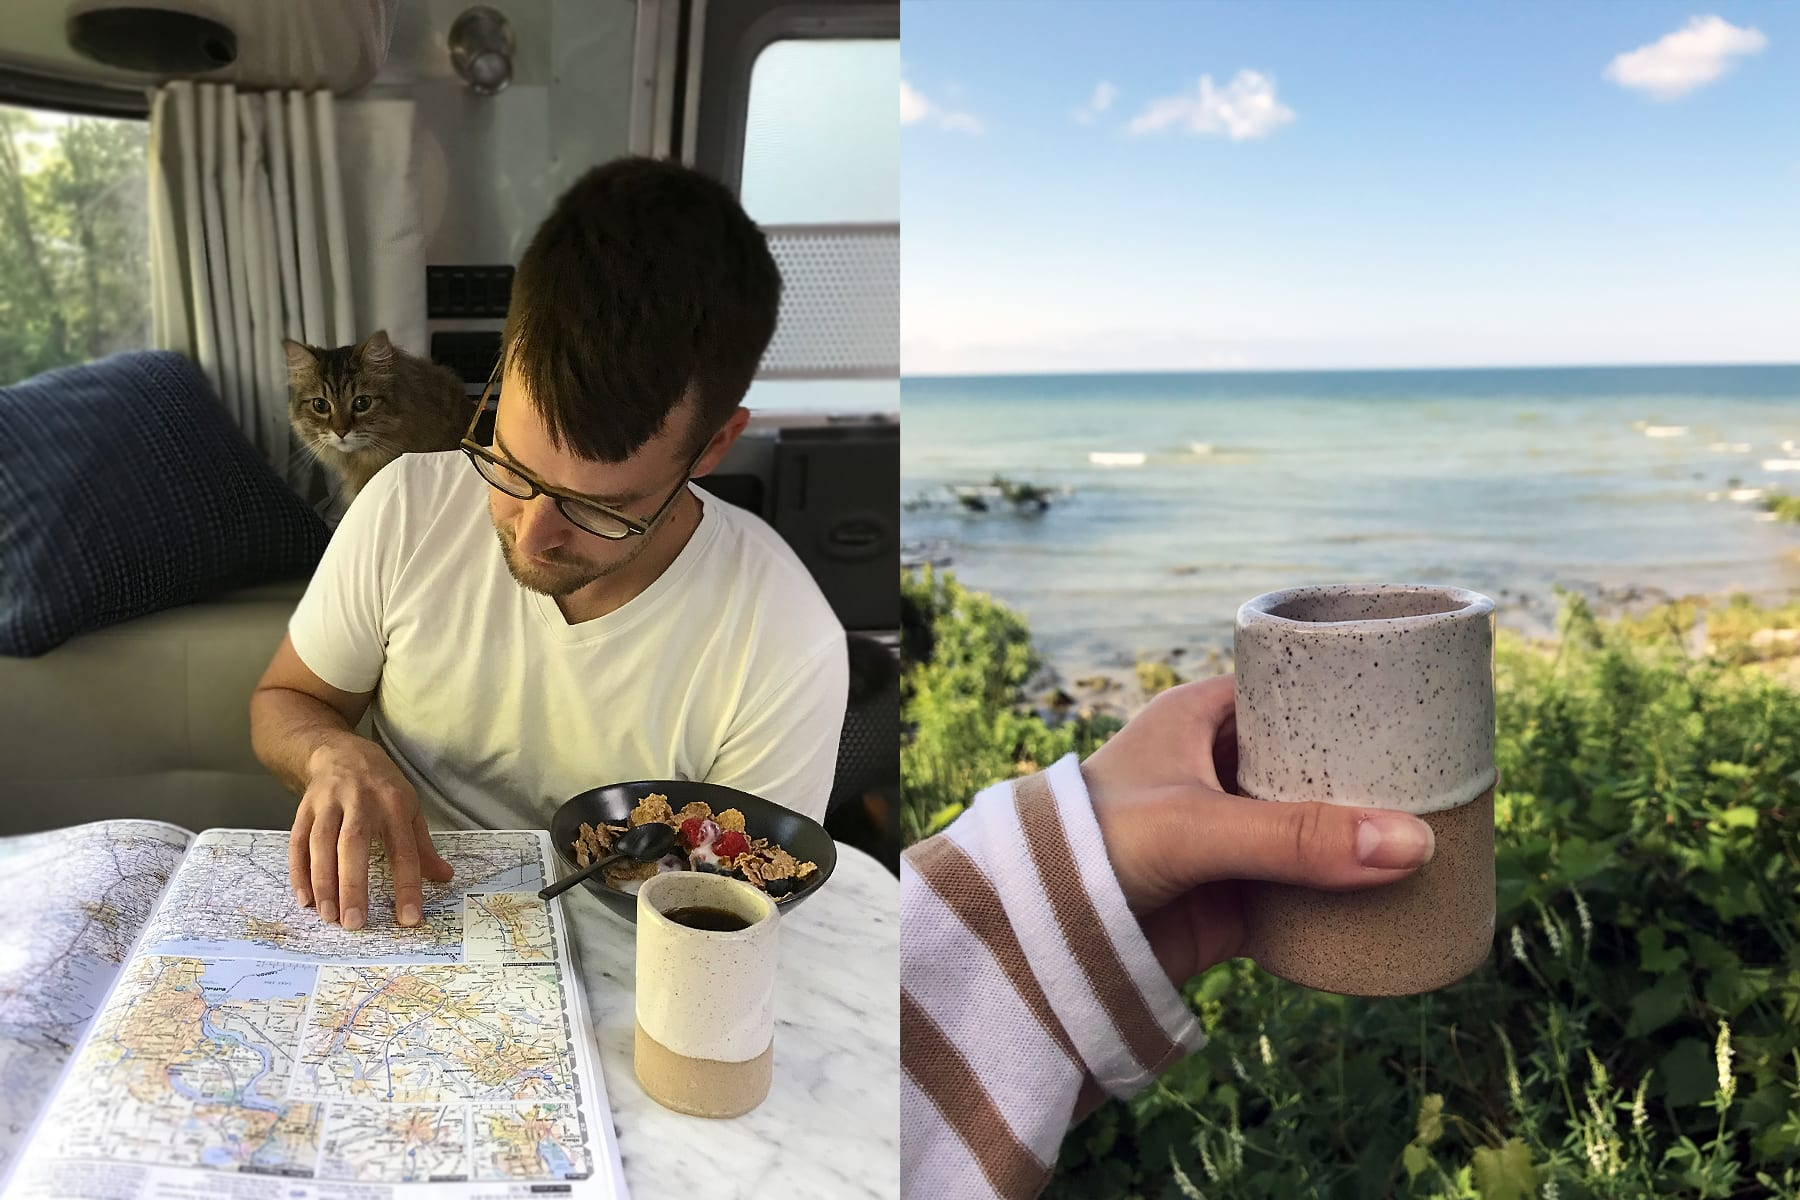 01-VT-journey-niagrafalls-morningcoffee02.jpg